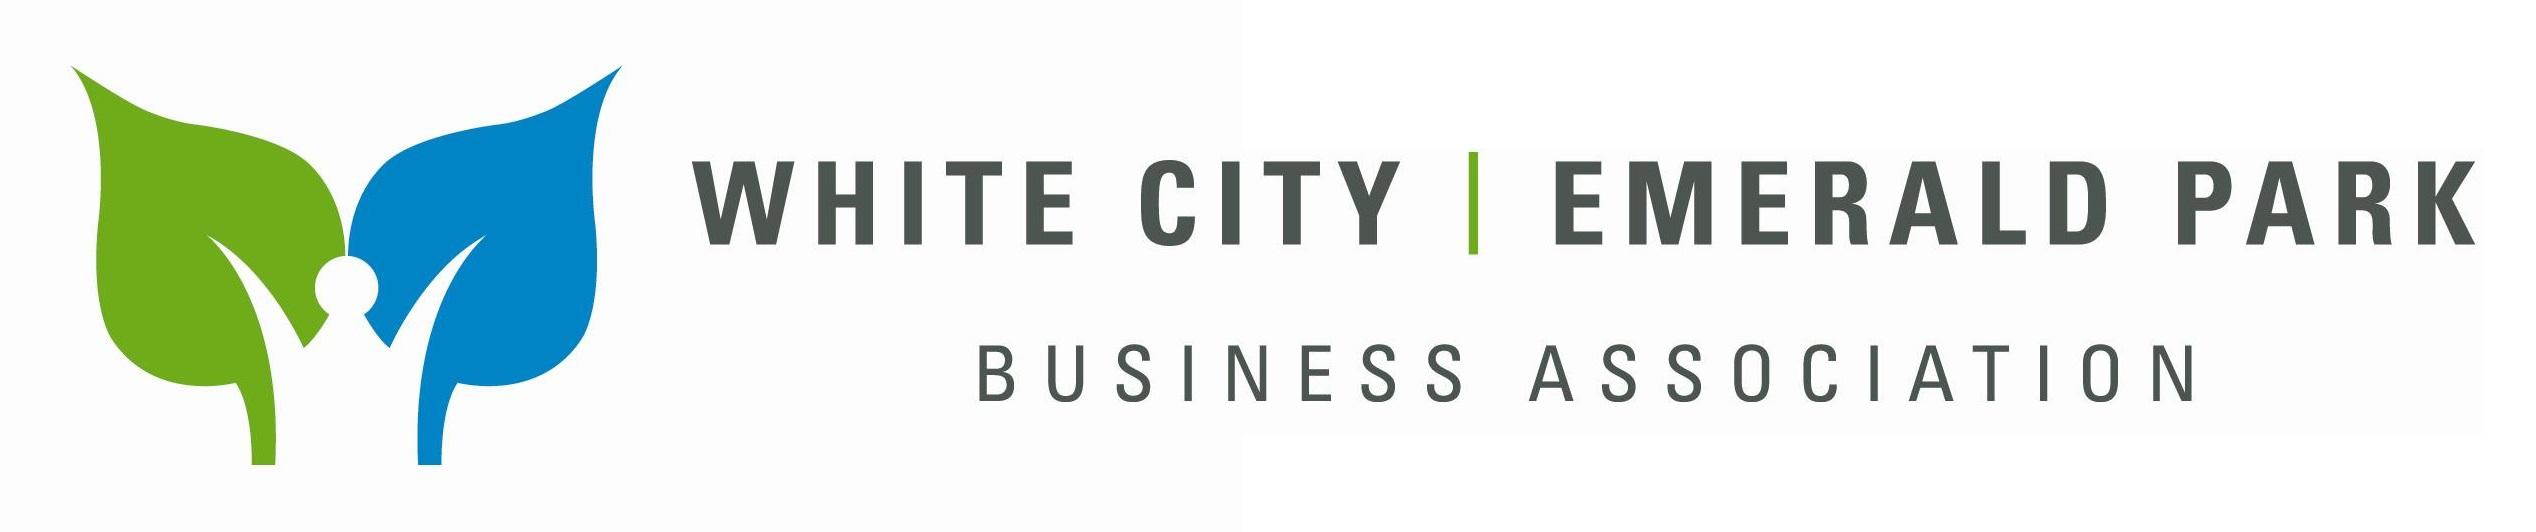 White City Emerald Park Business Association